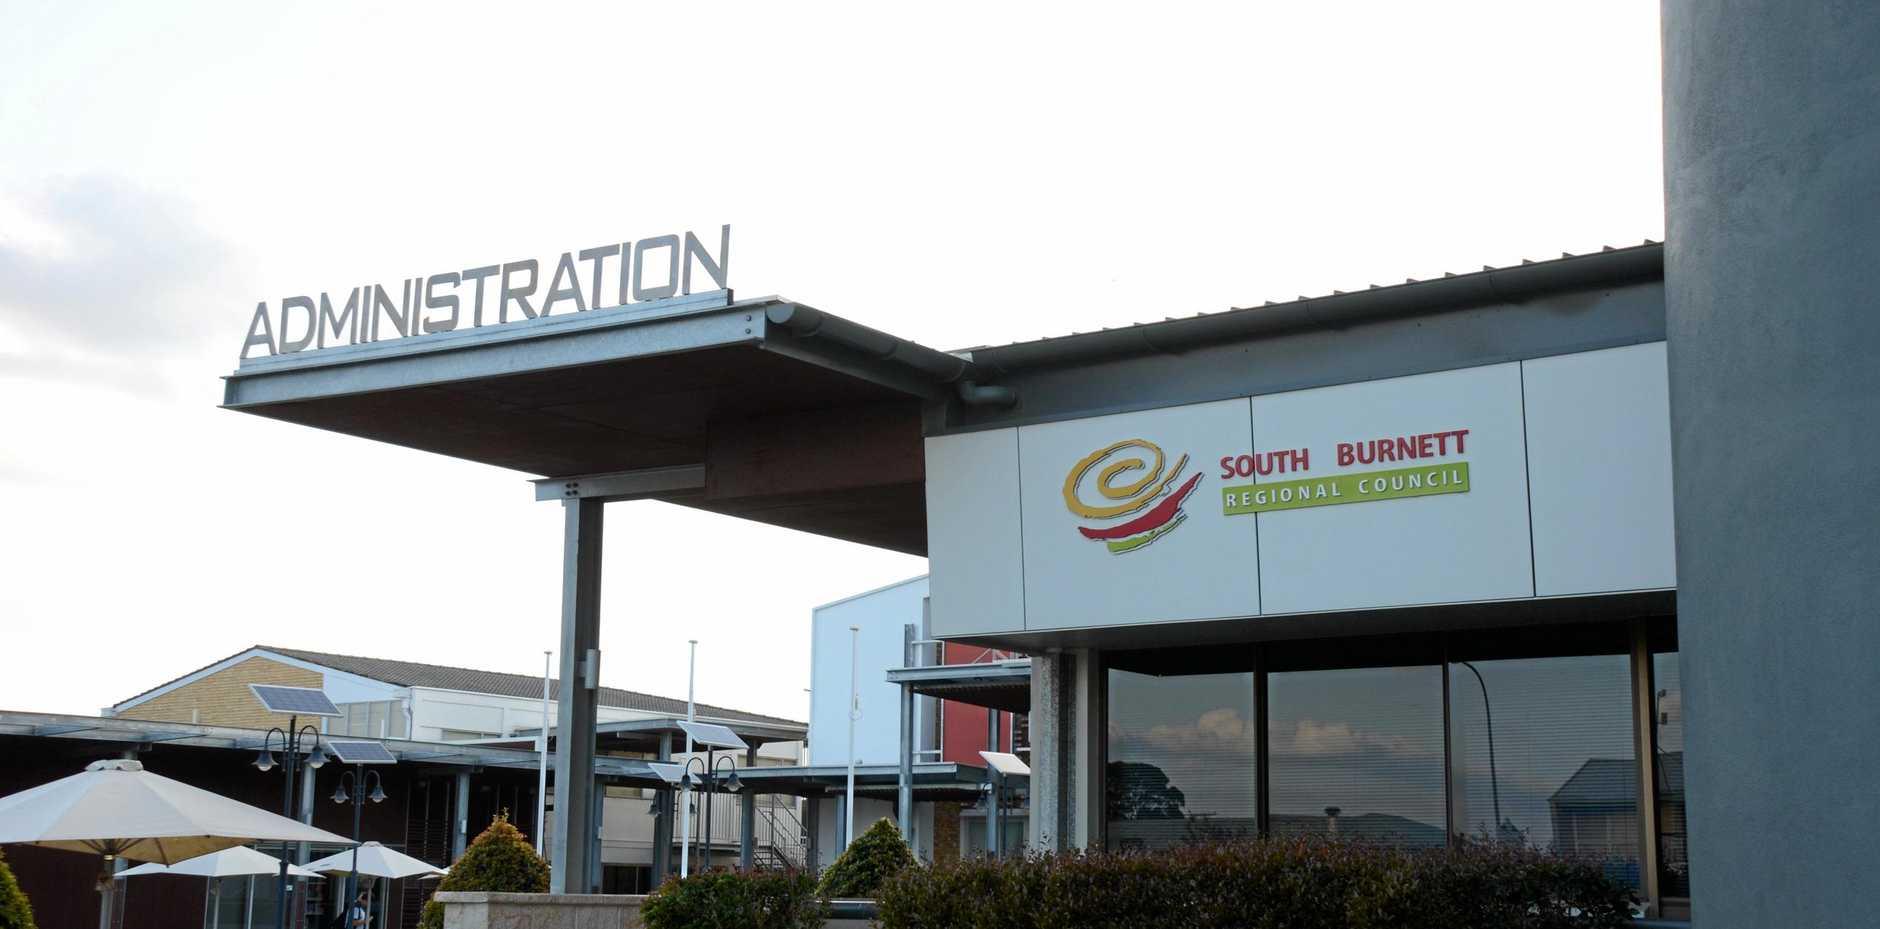 South Burnett Regional Council held their meeting on November 21.